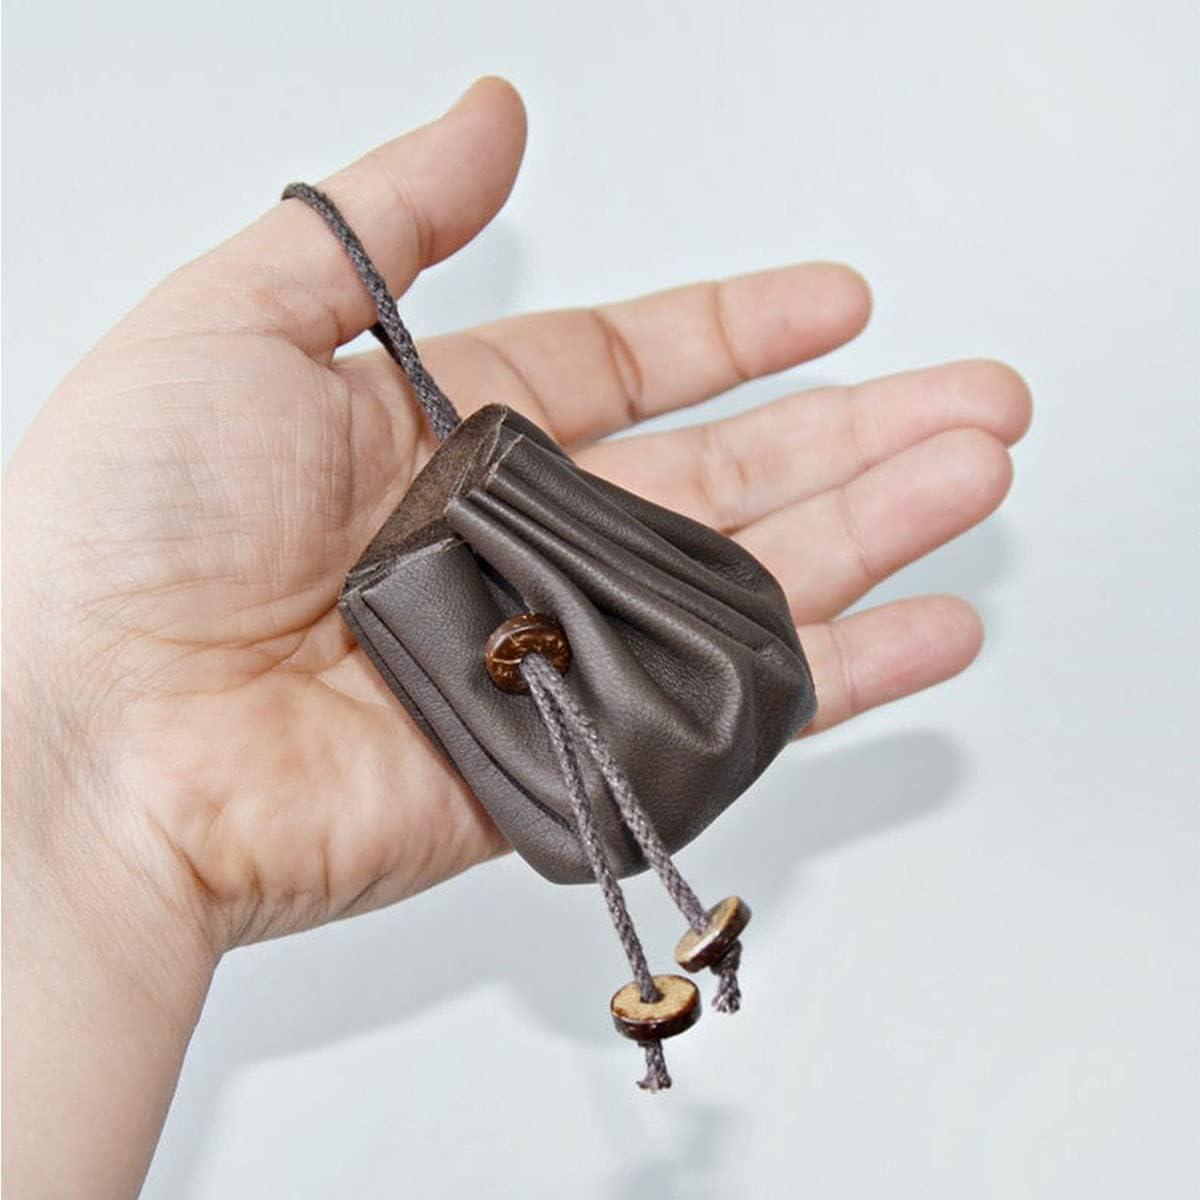 2 Pcs Leather Drawstring Coin Purse Pouch, Vintage Leather Belt Wallet Handbag for Adult, Medieval Renaissance Pouch Bag Viking Costume Accessory, Trinket Bag